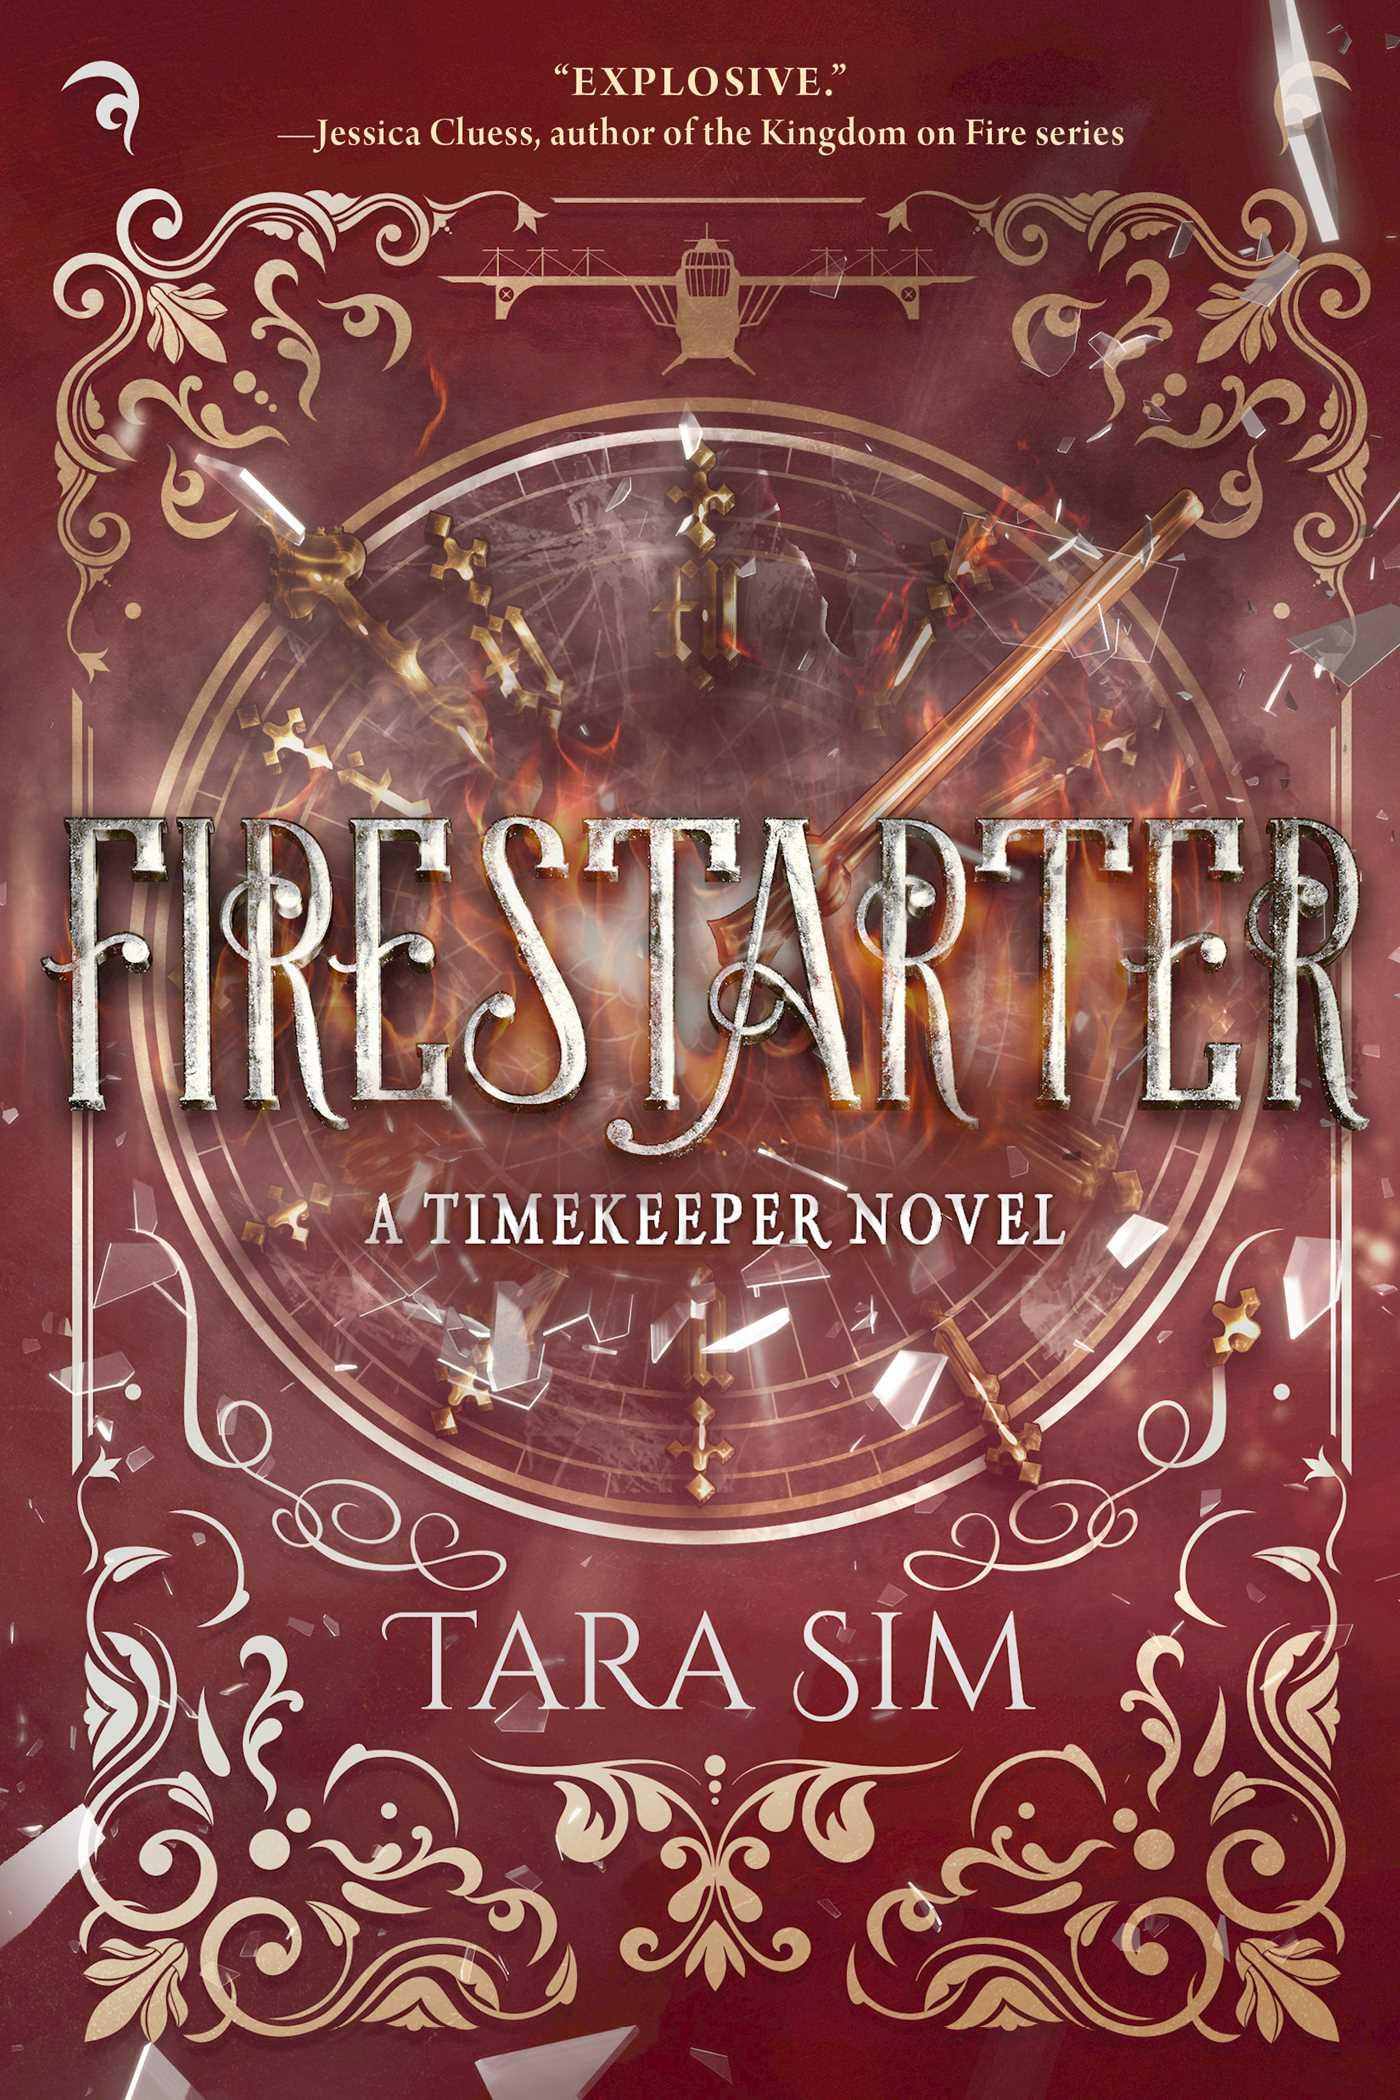 Firestarter (Timekeeper #3) by Tara Sim